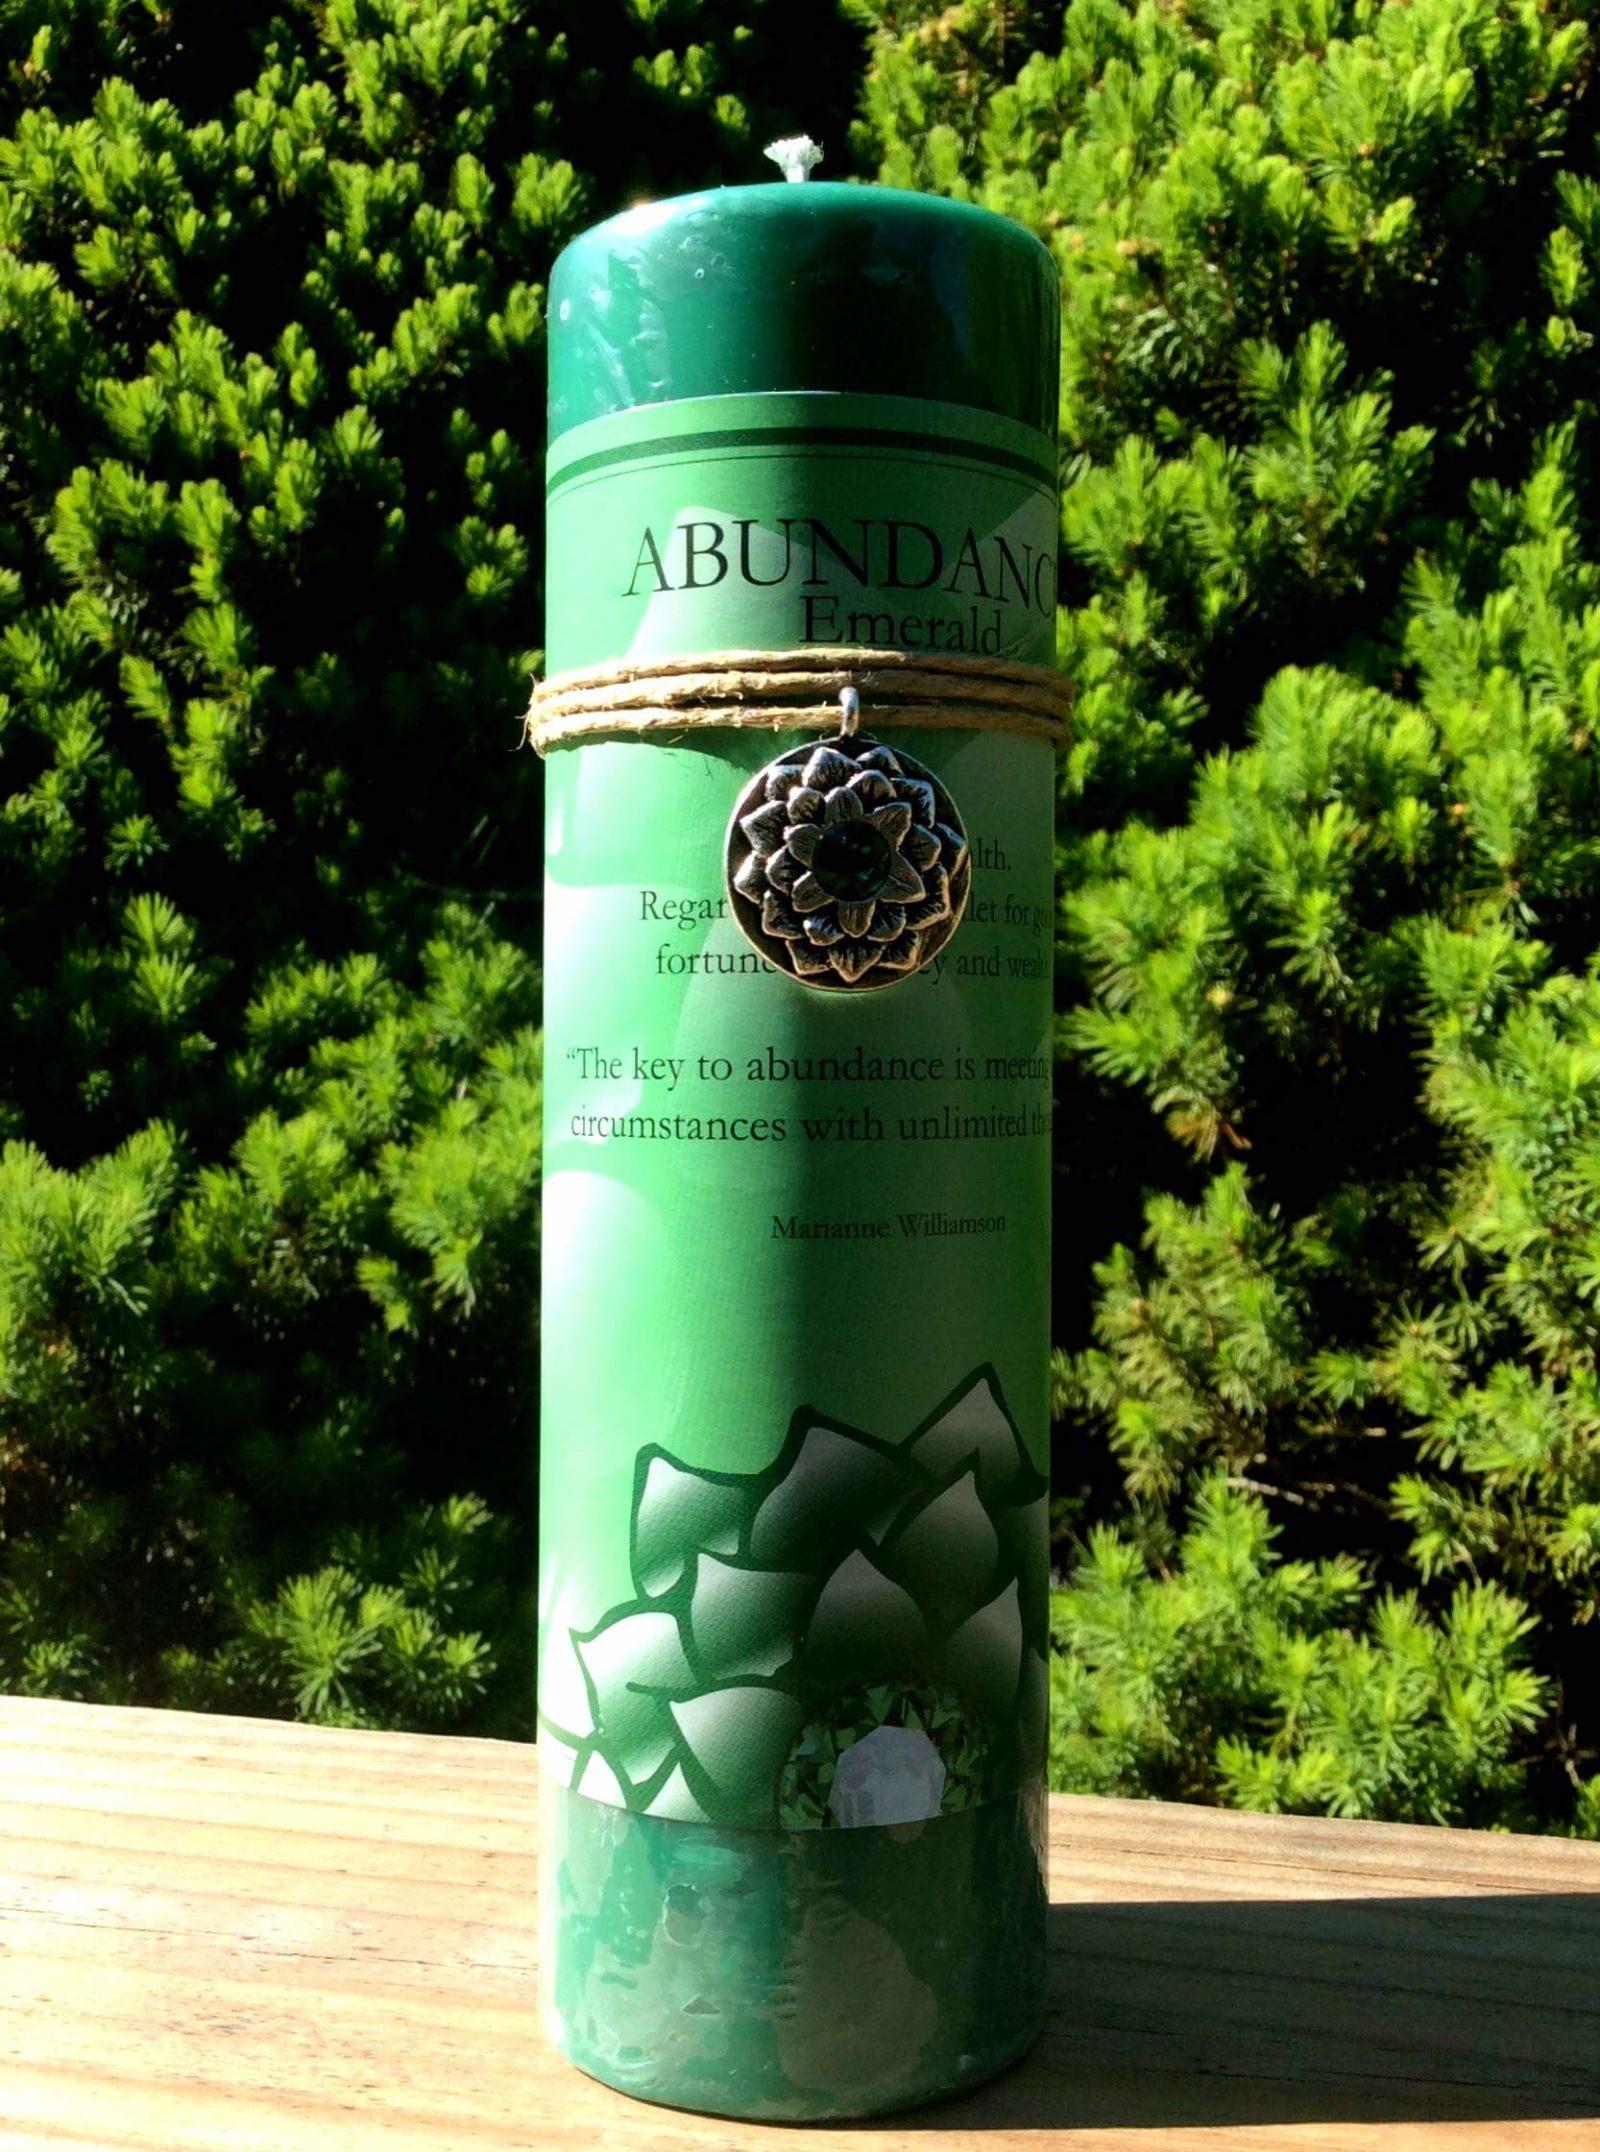 Lotus Abundance Candle Emerald at MVC